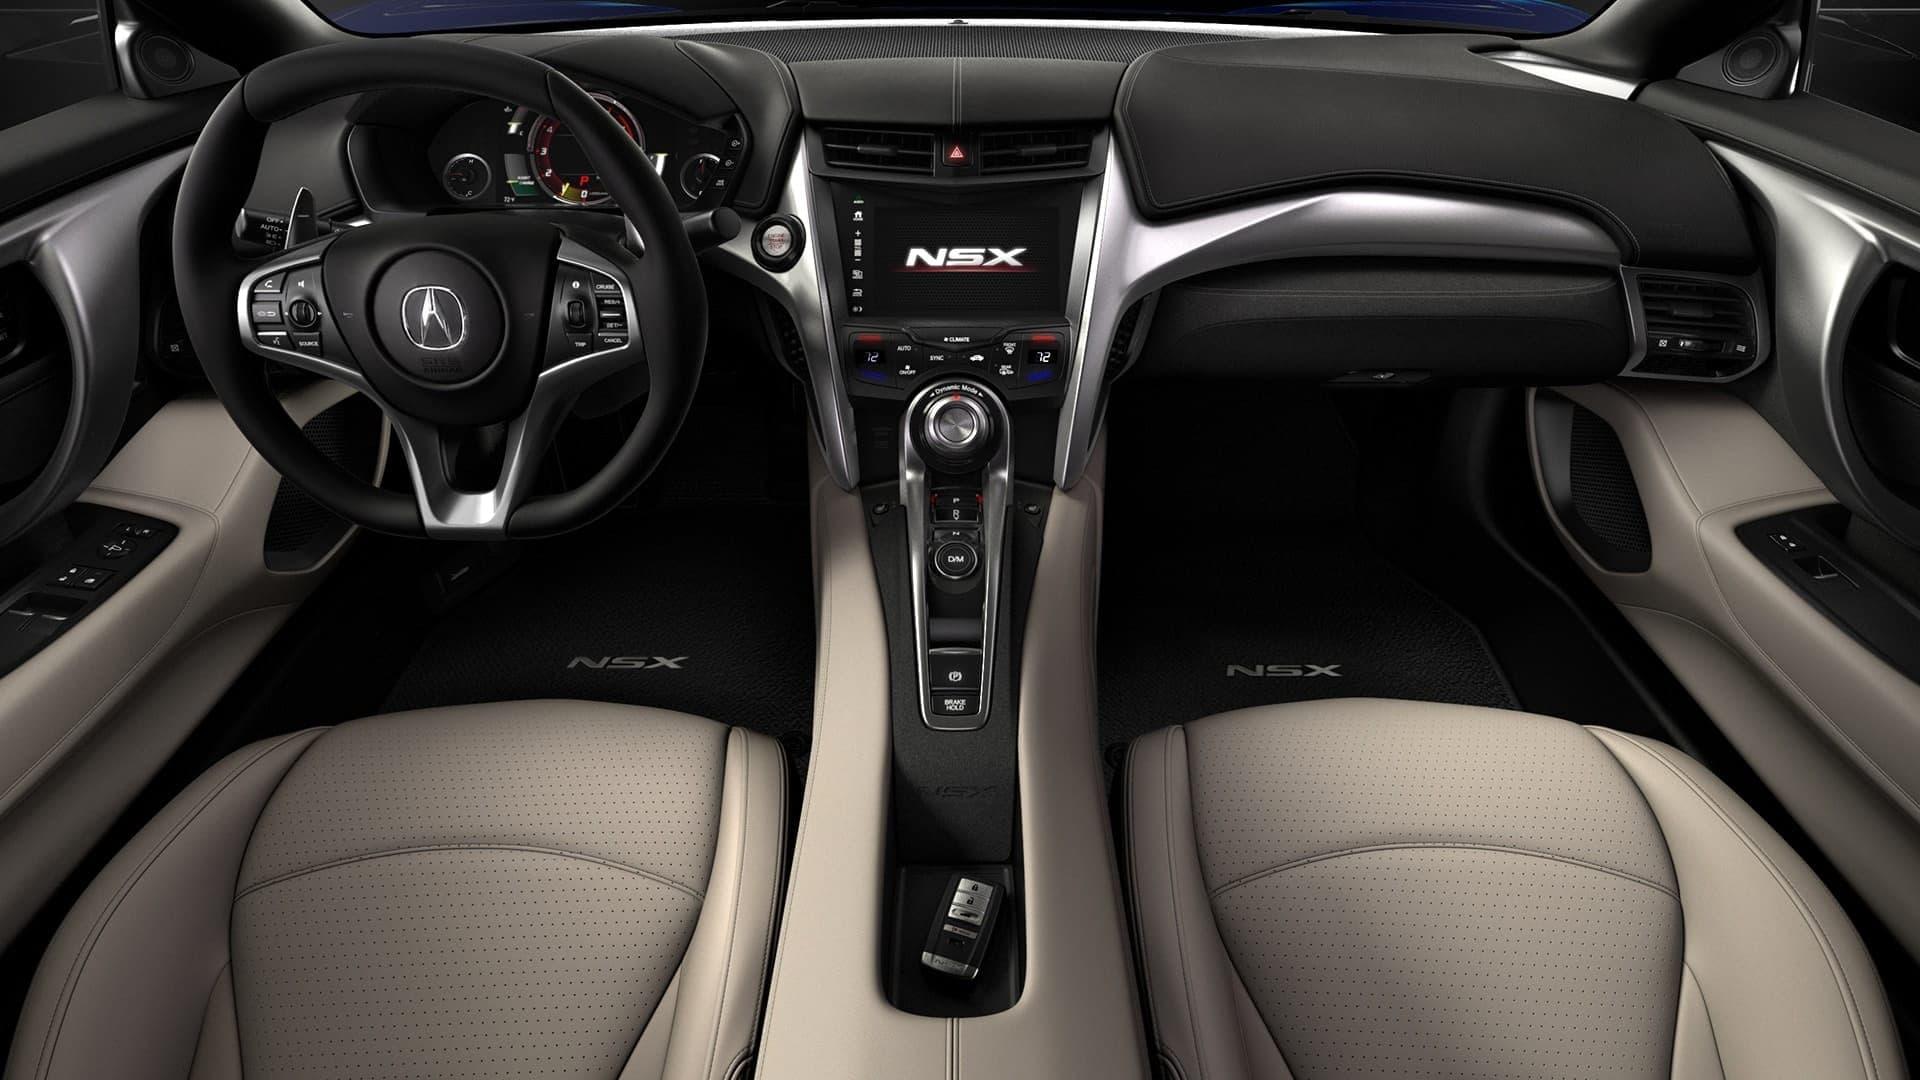 2017 Acura NSX vs 2017 Nissan GT R near Washington DC Pohanka